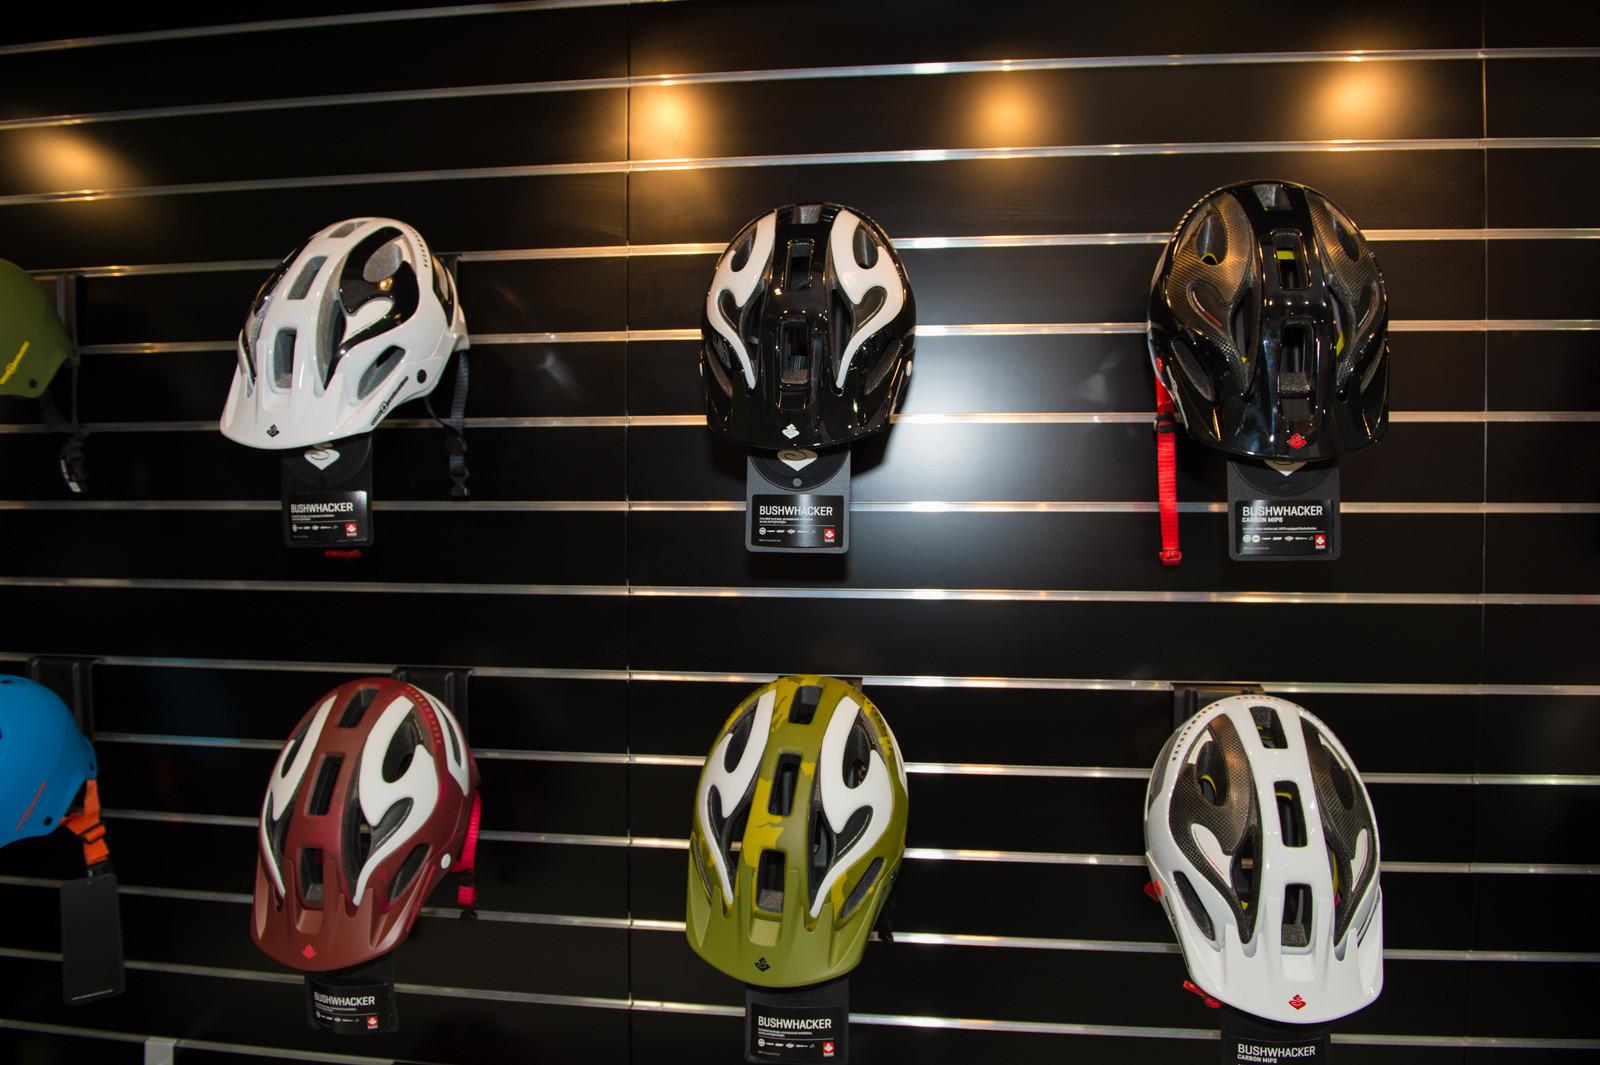 Sweet Protection Bushwhacker Helmets - 2014 Mountain Bike Apparel & Protection at Eurobike 2013 - Mountain Biking Pictures - Vital MTB